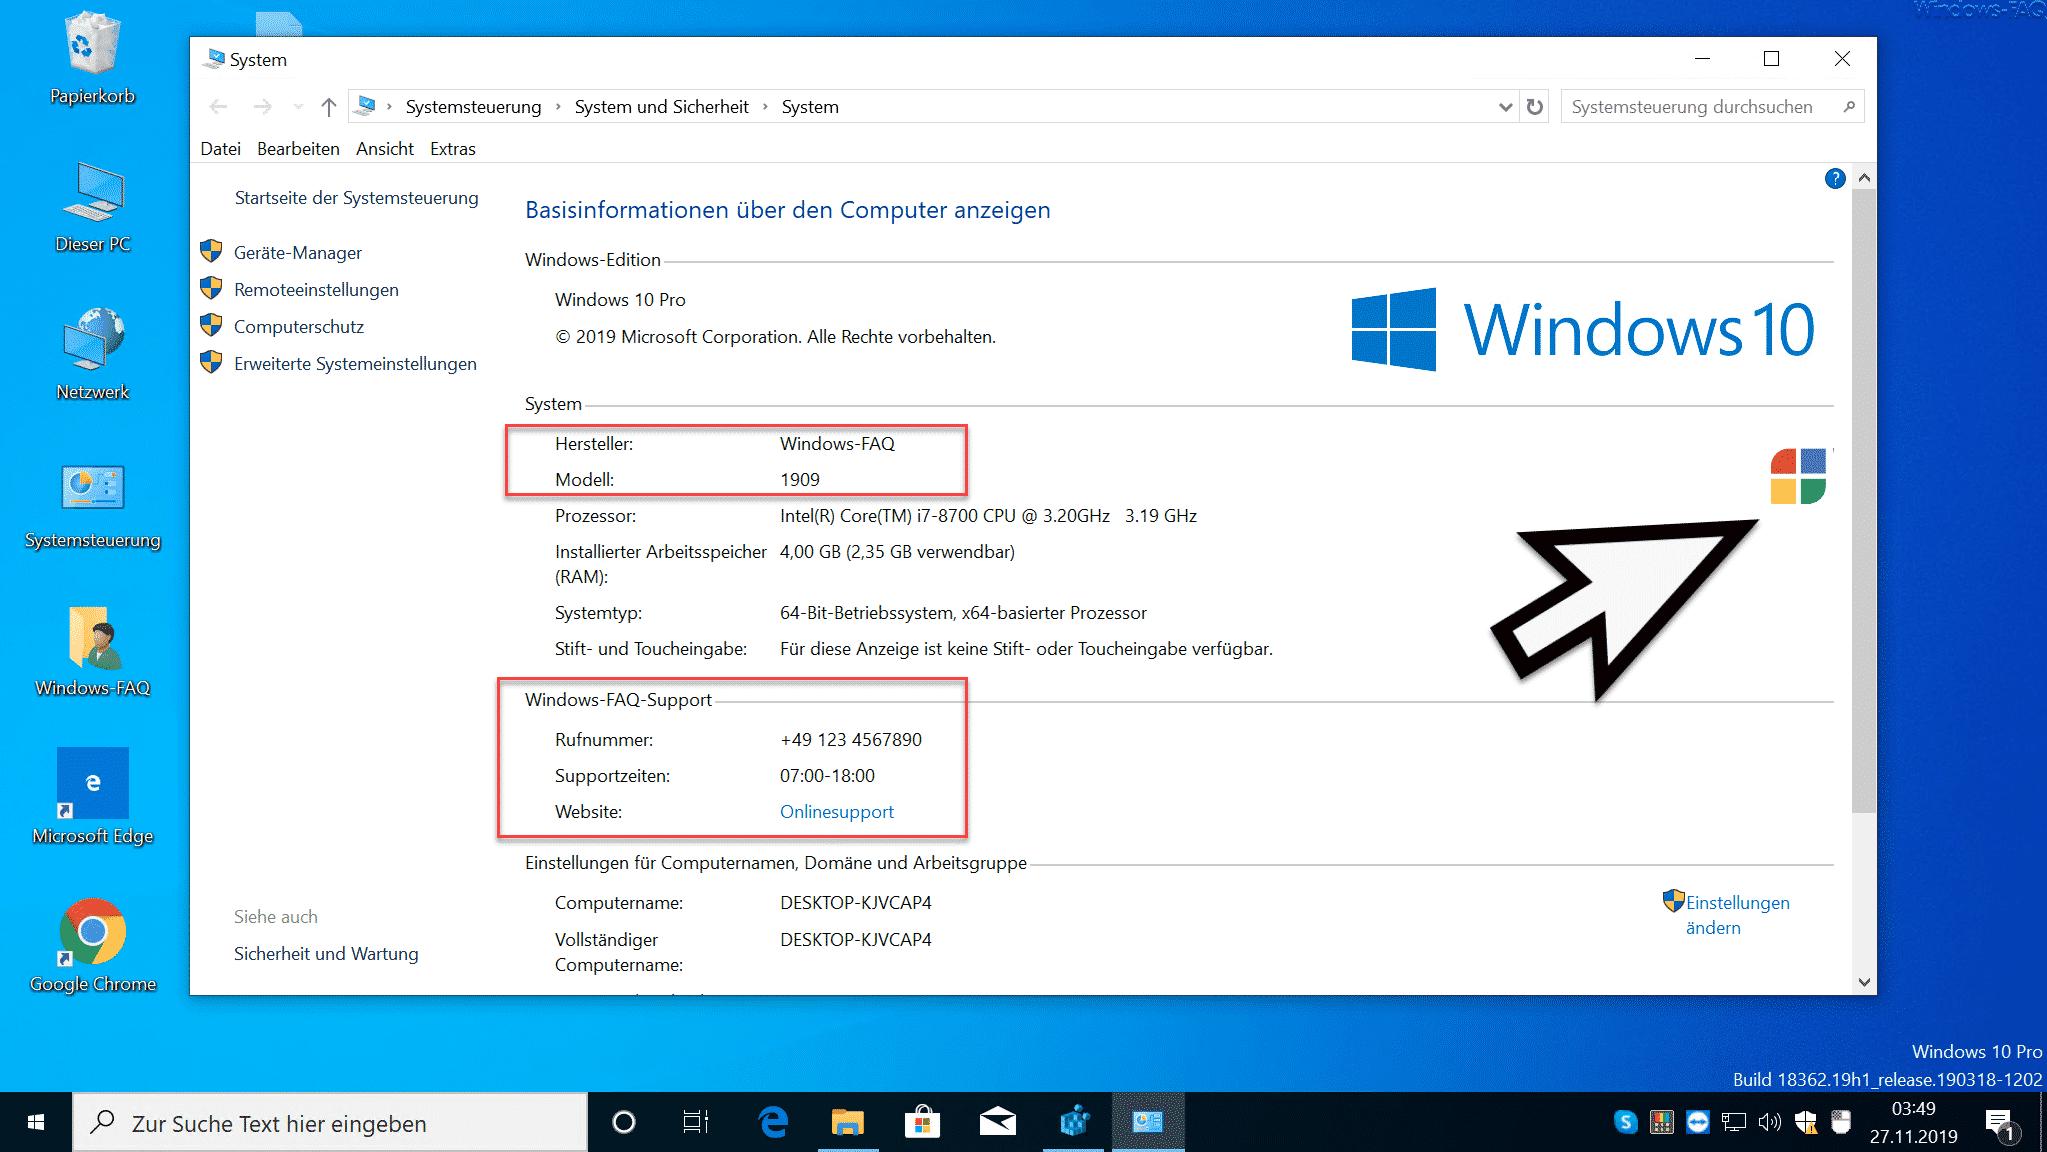 Computerinformationen per Registry ergänzt